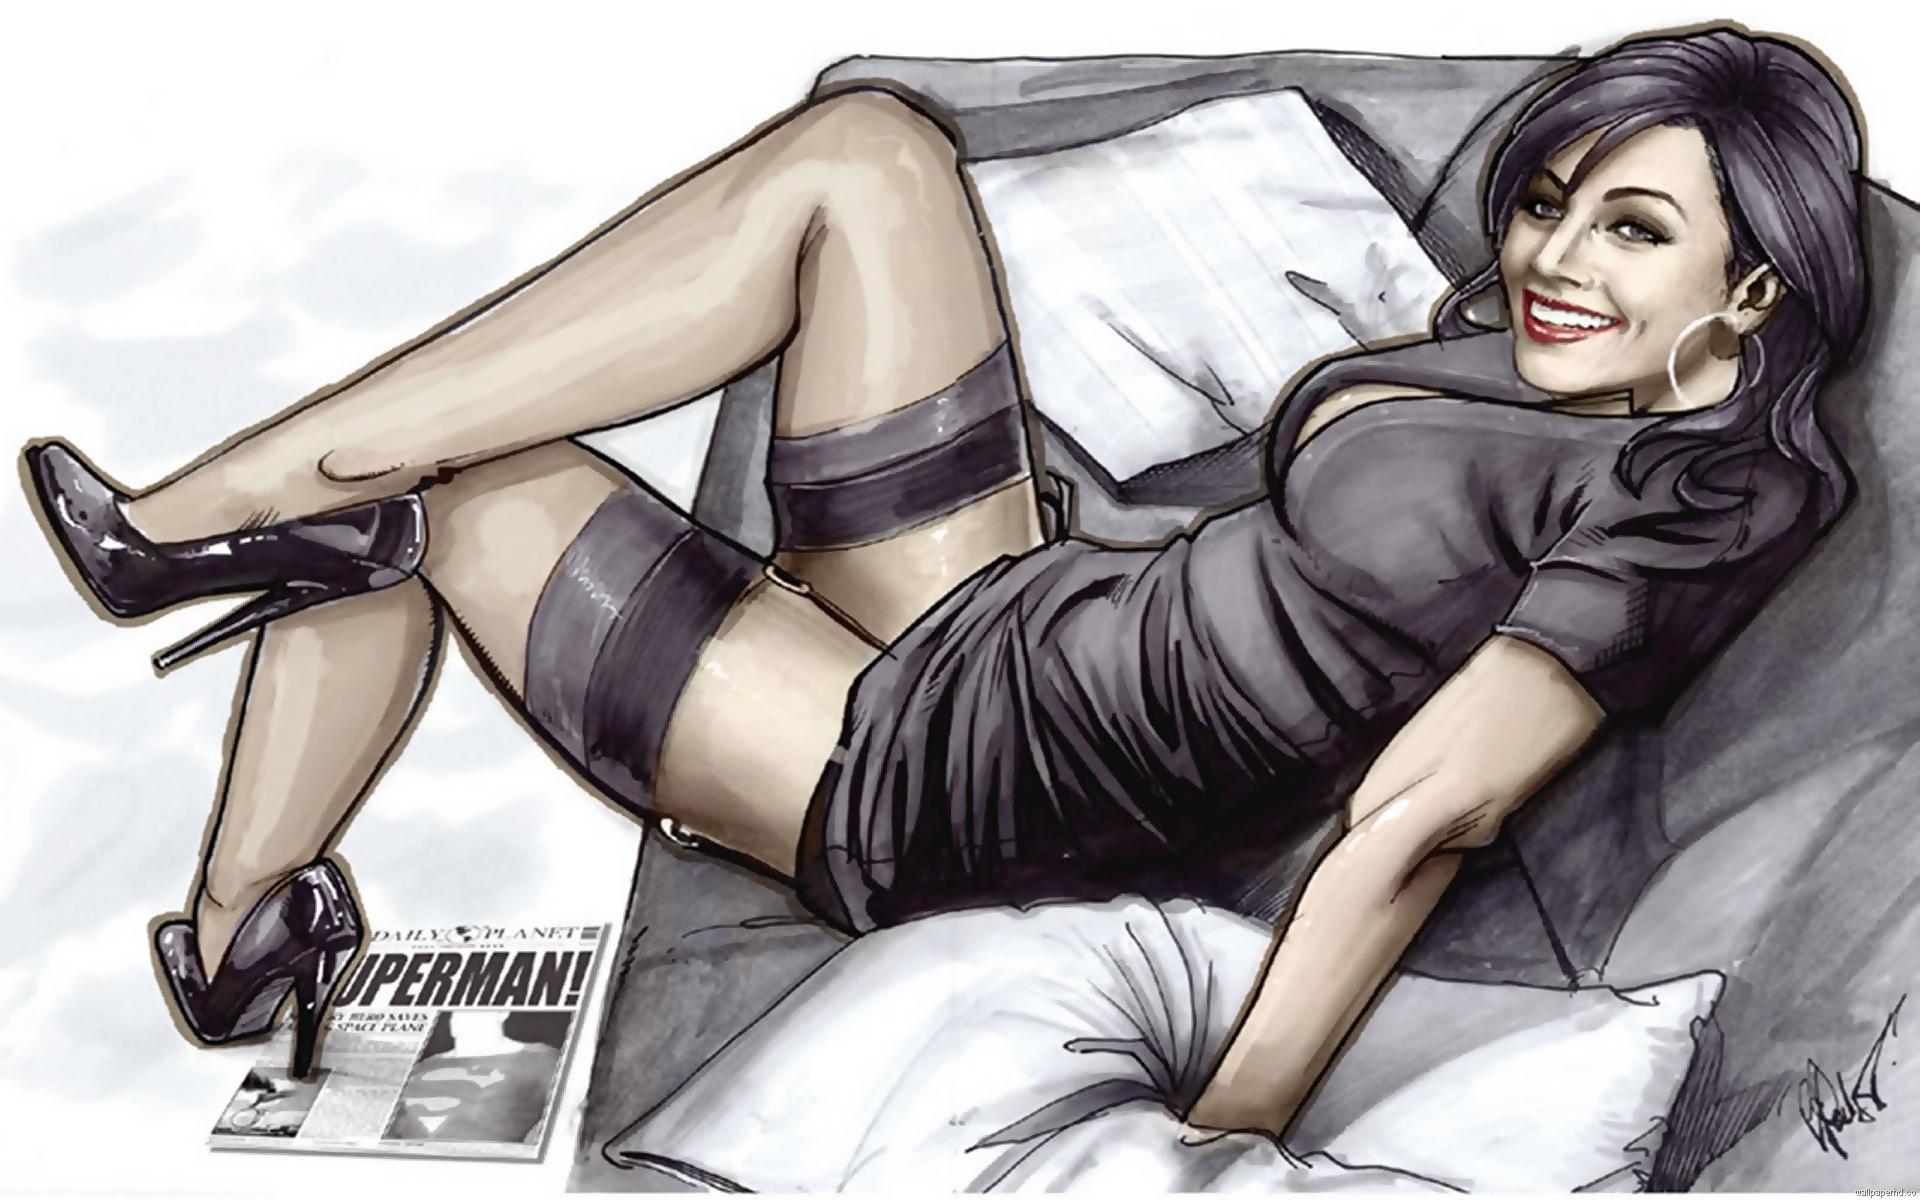 pakistani comic sex image